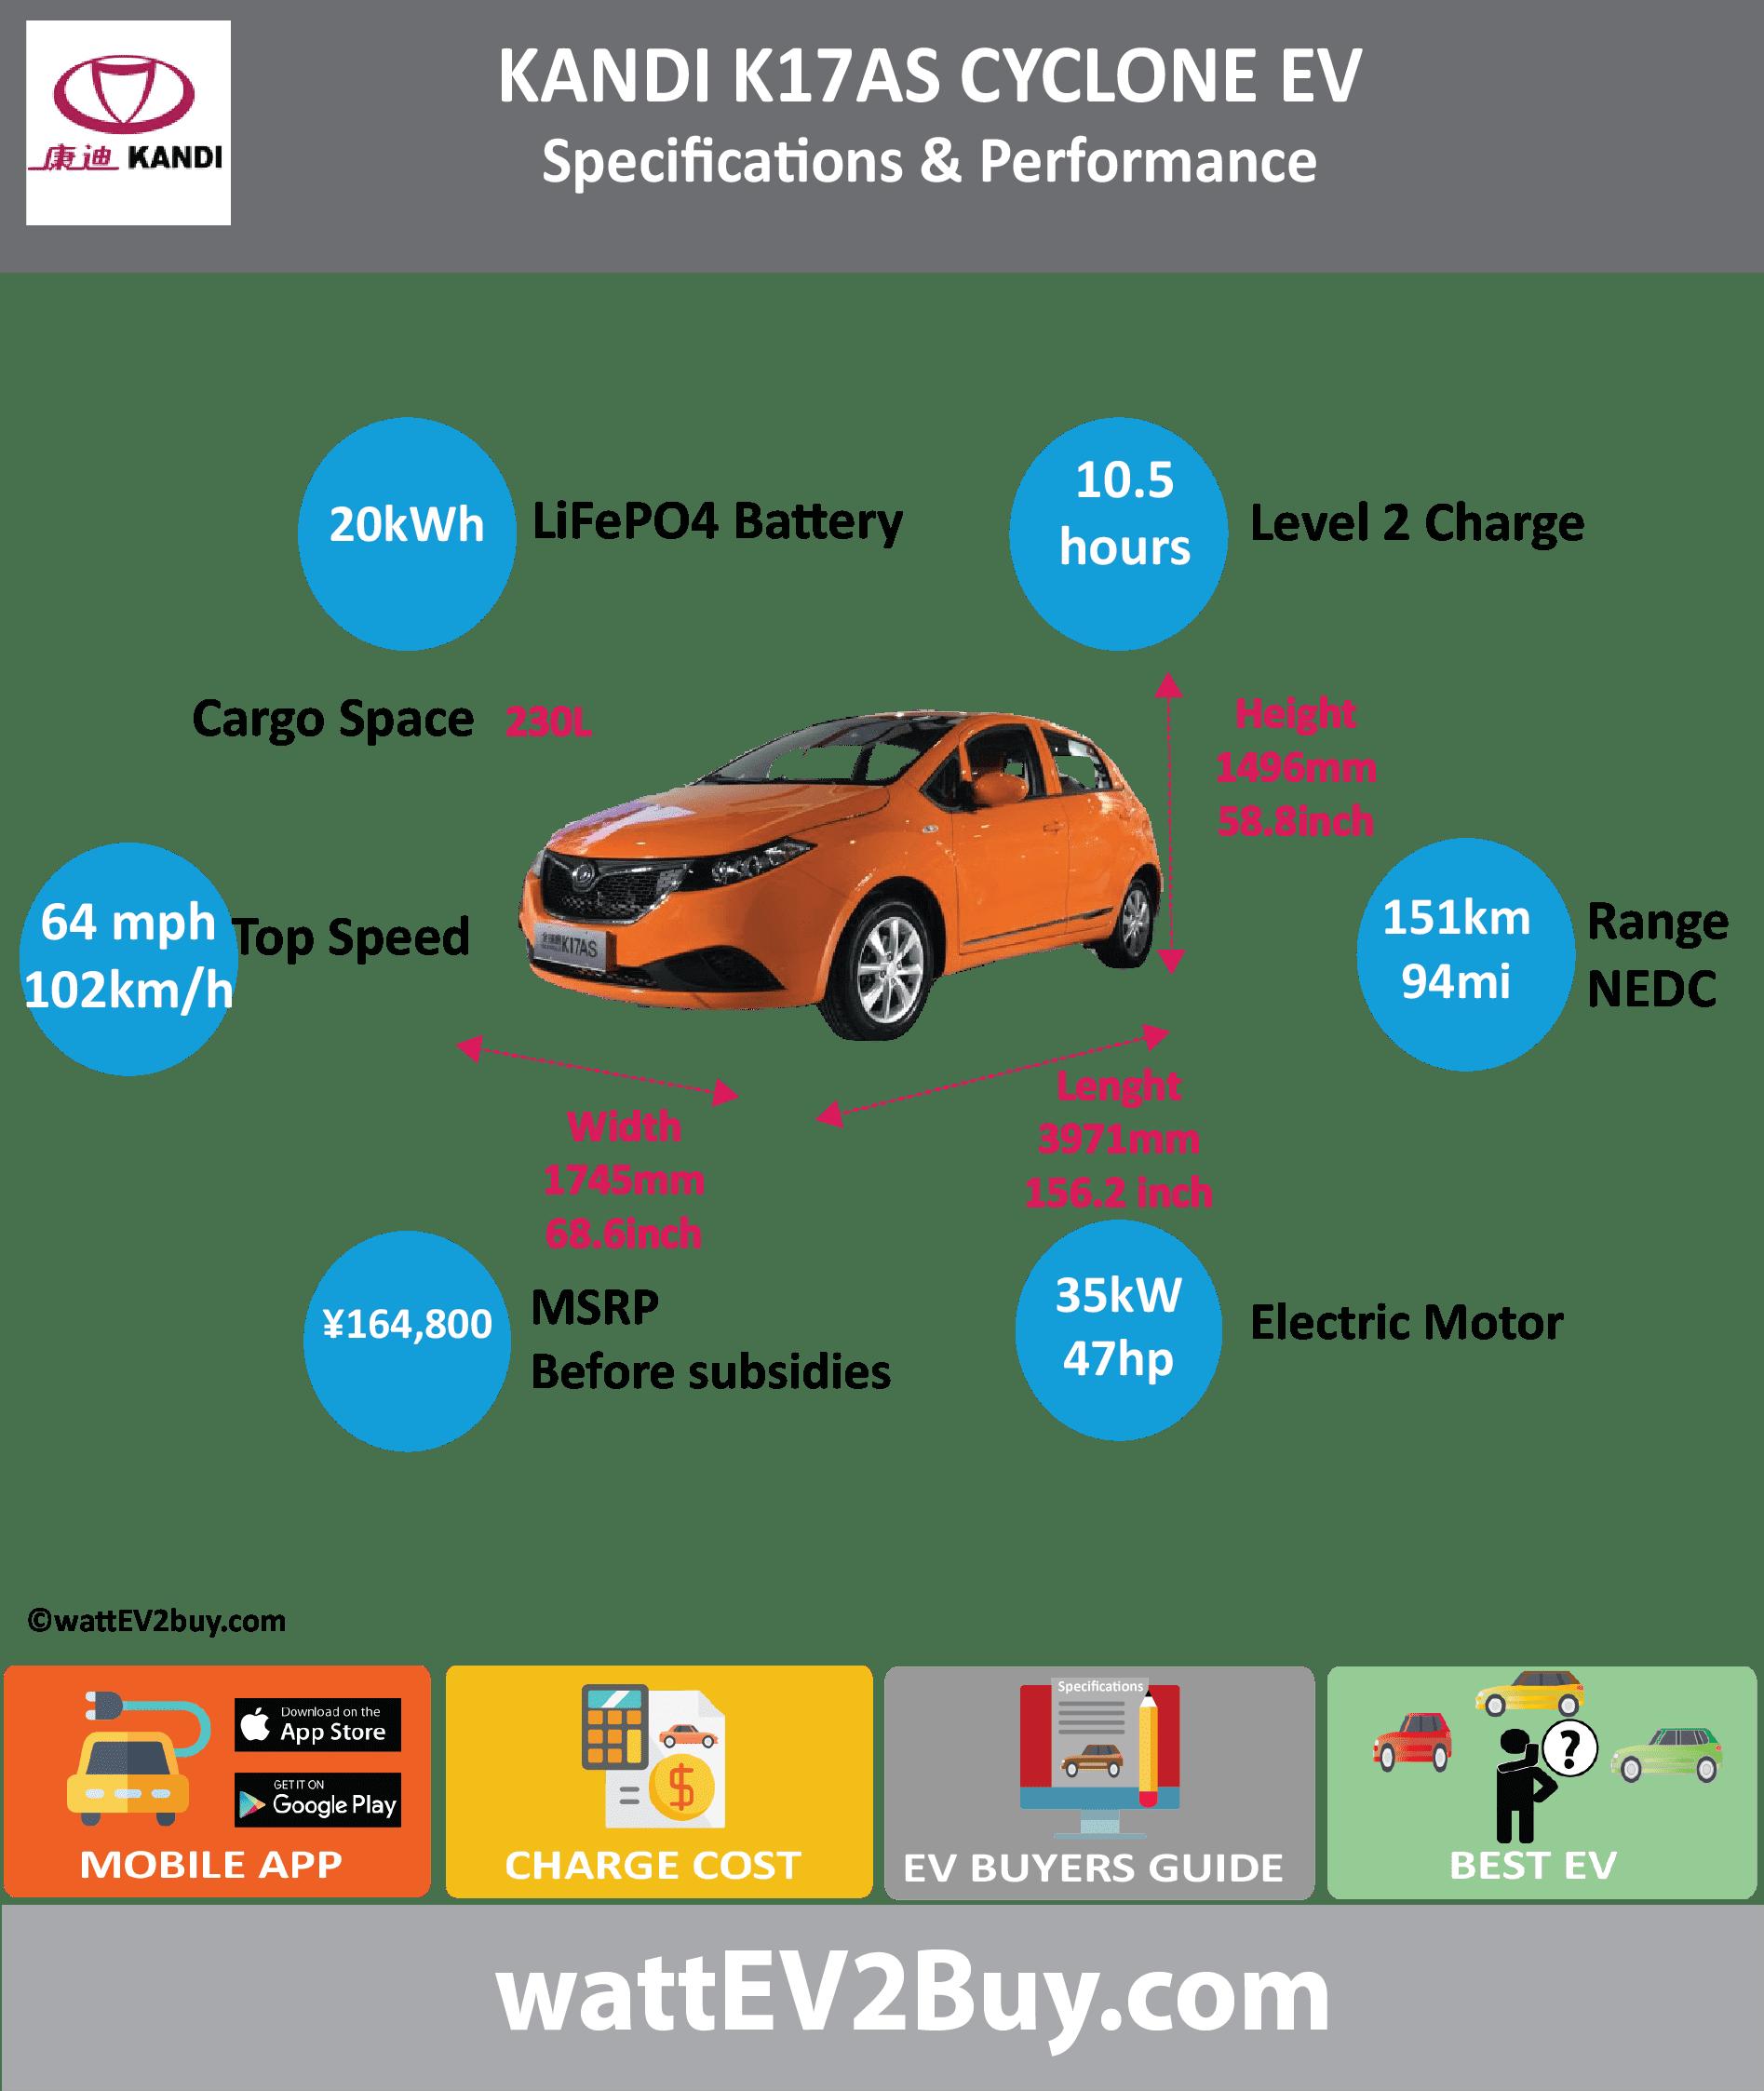 Kandi Cyclone Specs Card Wireless Power Transmission Market Detailed